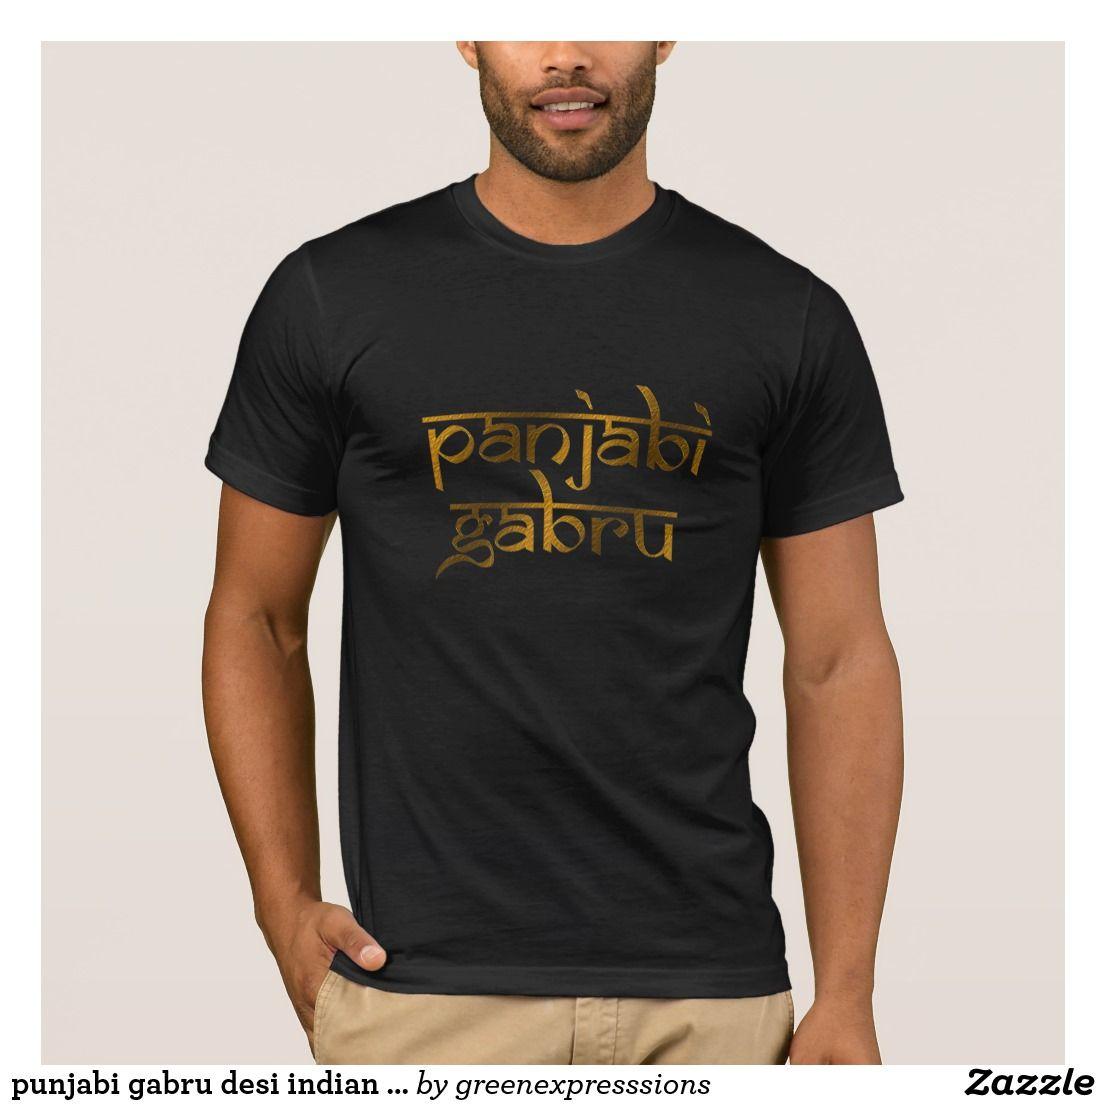 0b9b0e3bc5 punjabi gabru desi indian pride t-shirt design | Zazzle.com ...